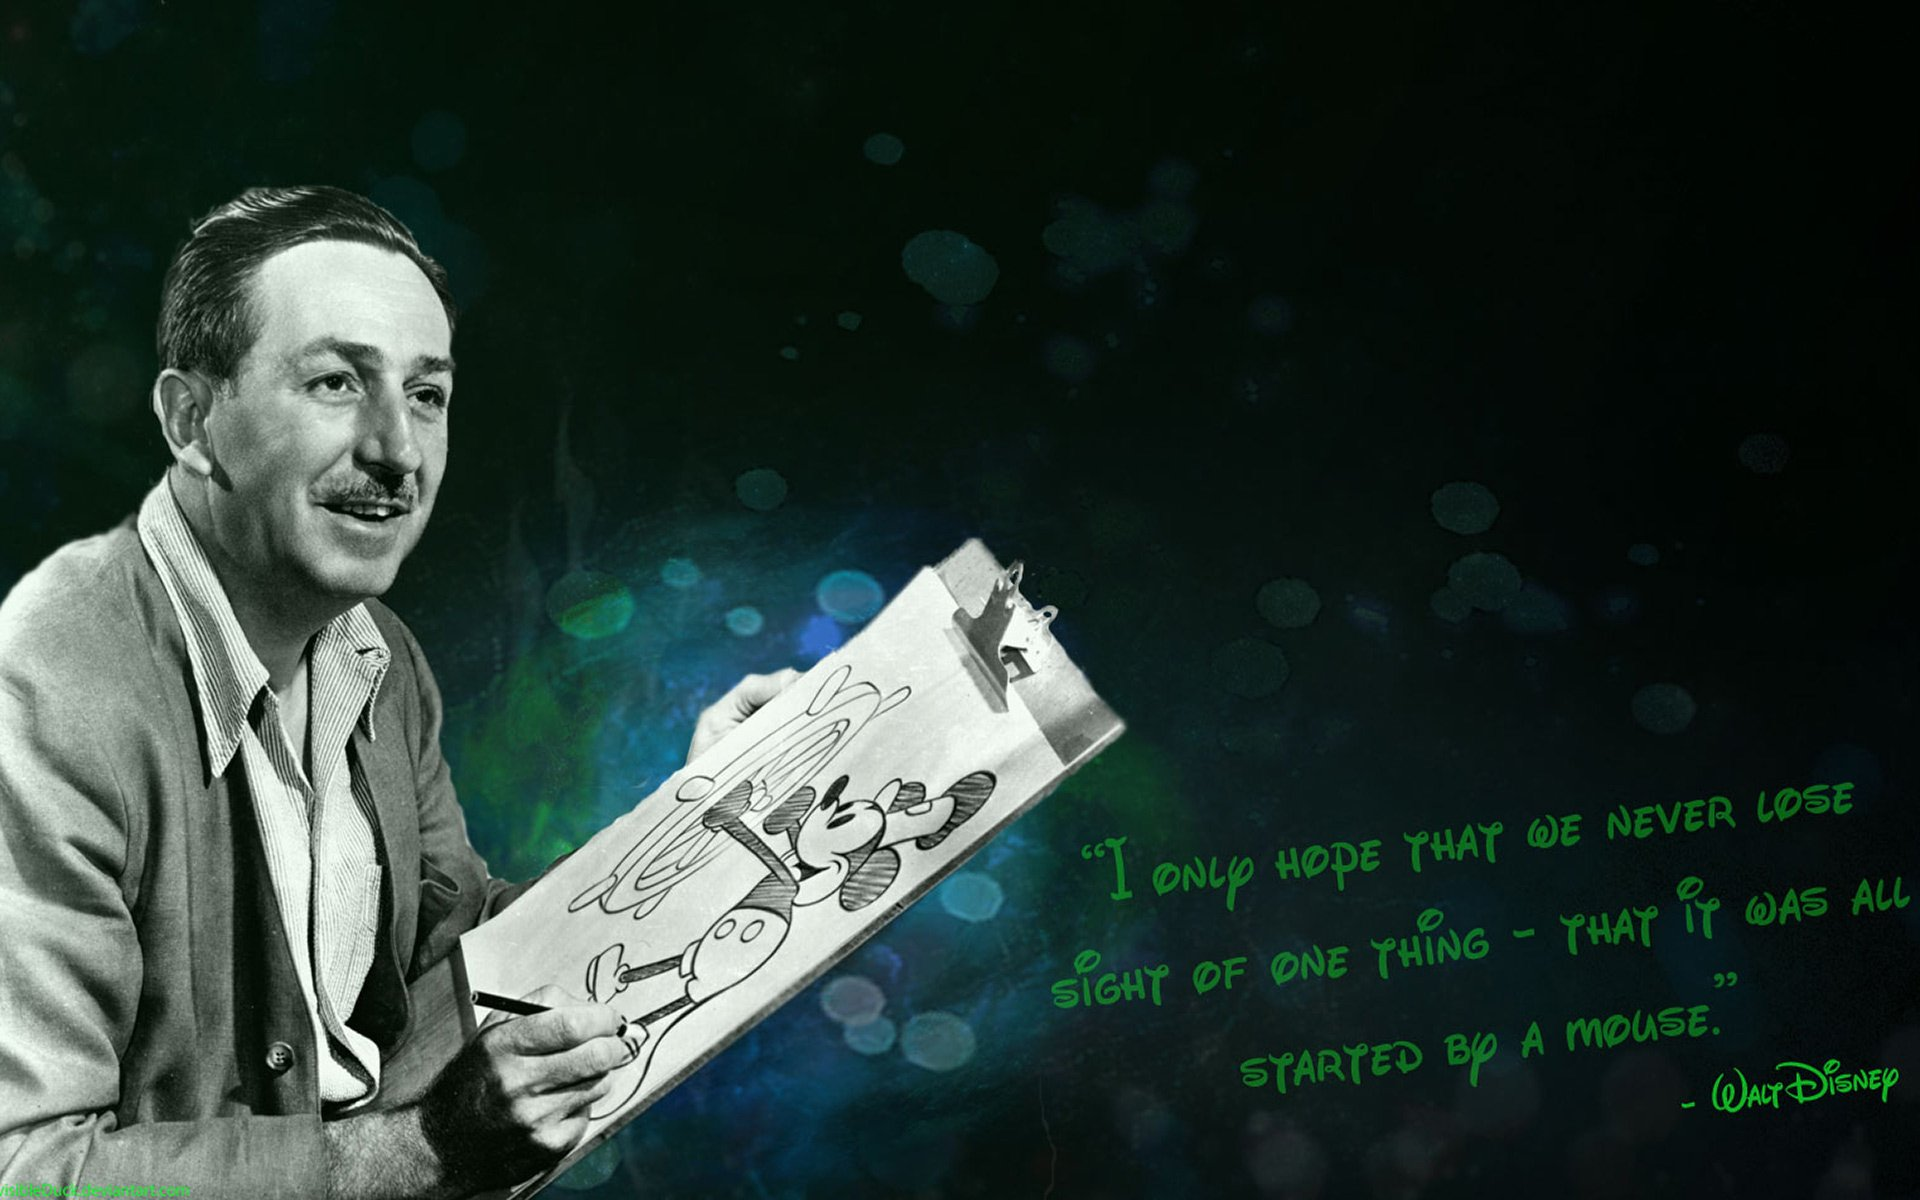 Cartoons Wallpapers   Mickey Mouse   Walt Disney 1920x1200 wallpaper 1920x1200